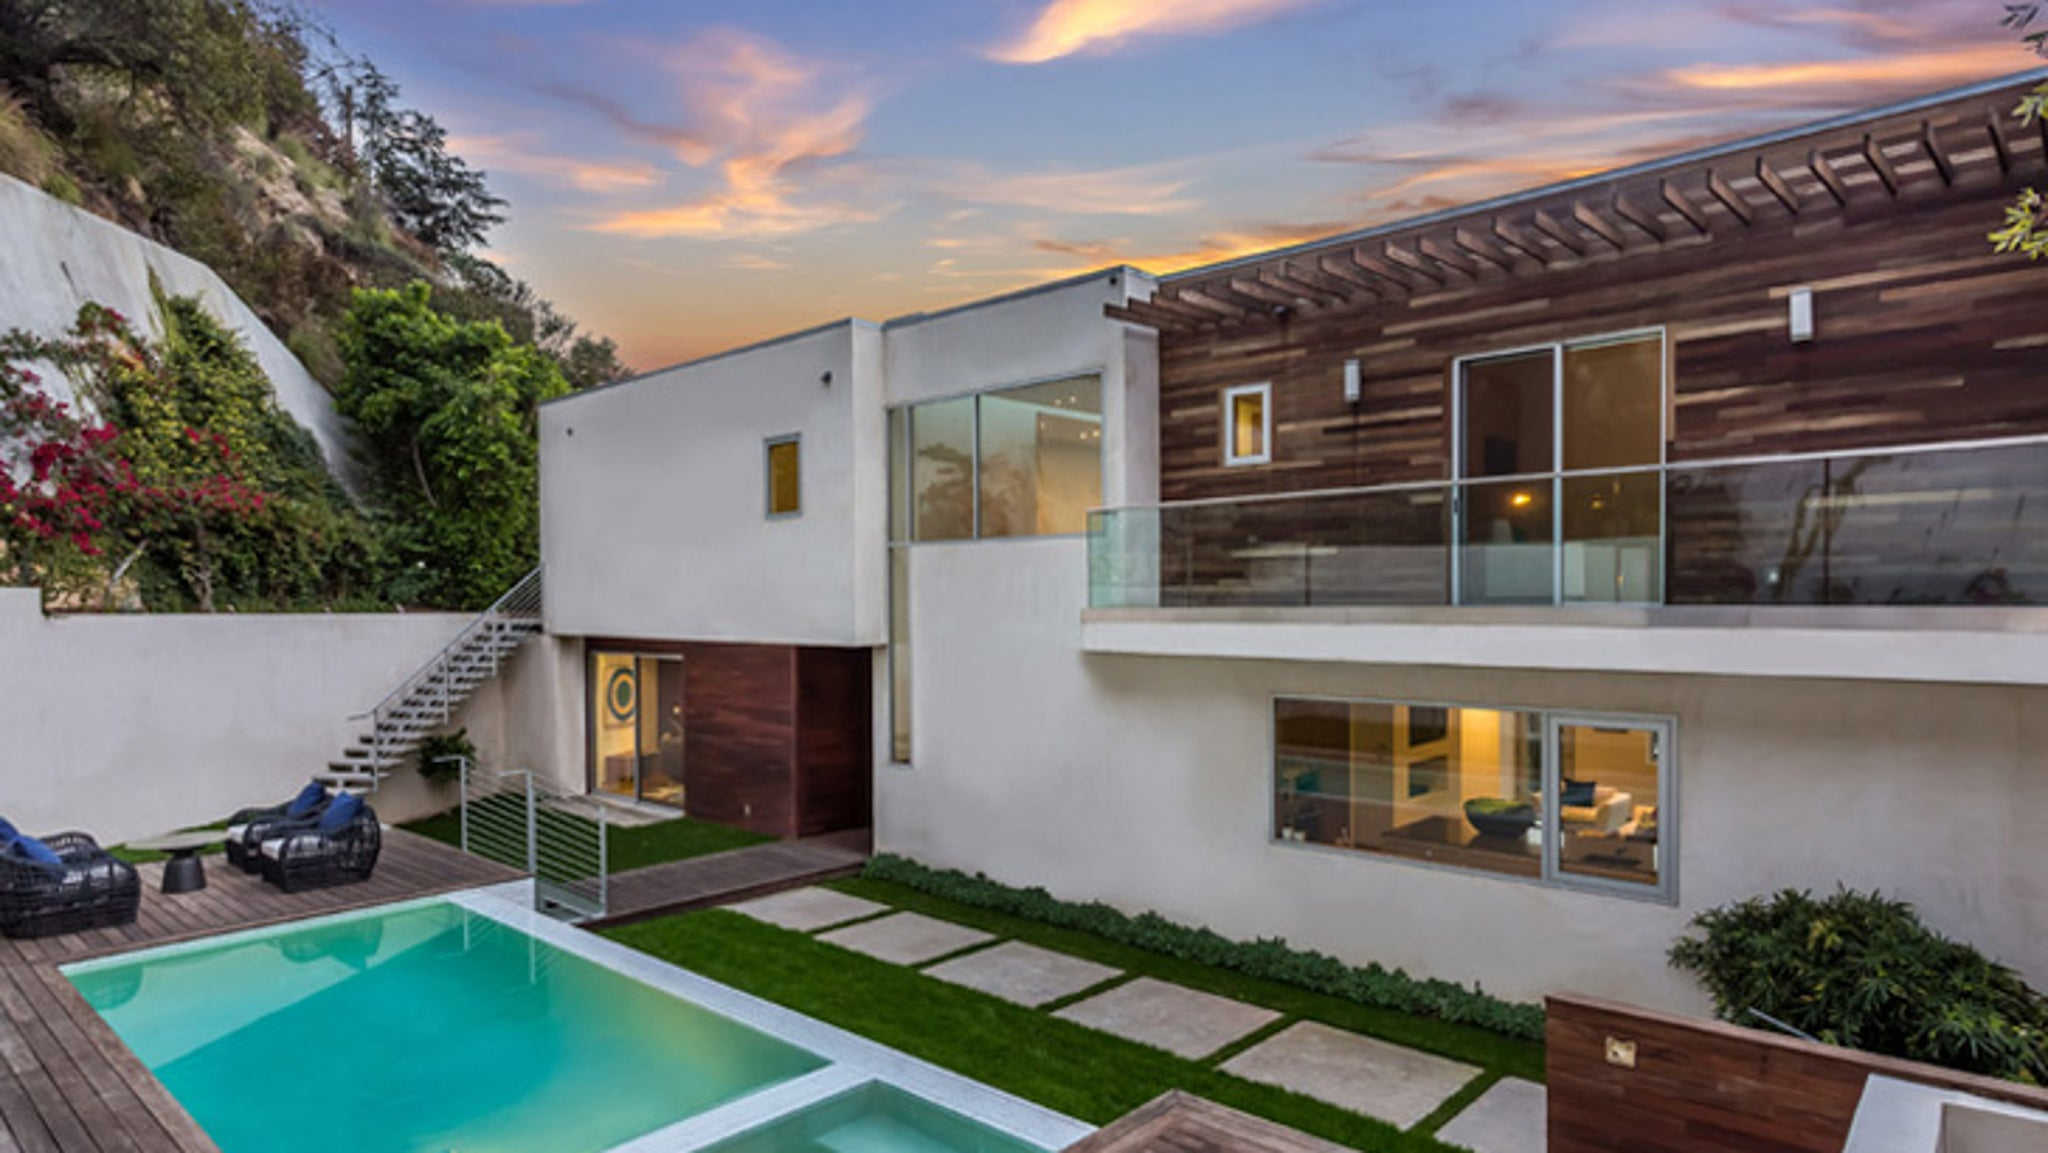 Hugh Hefner Home